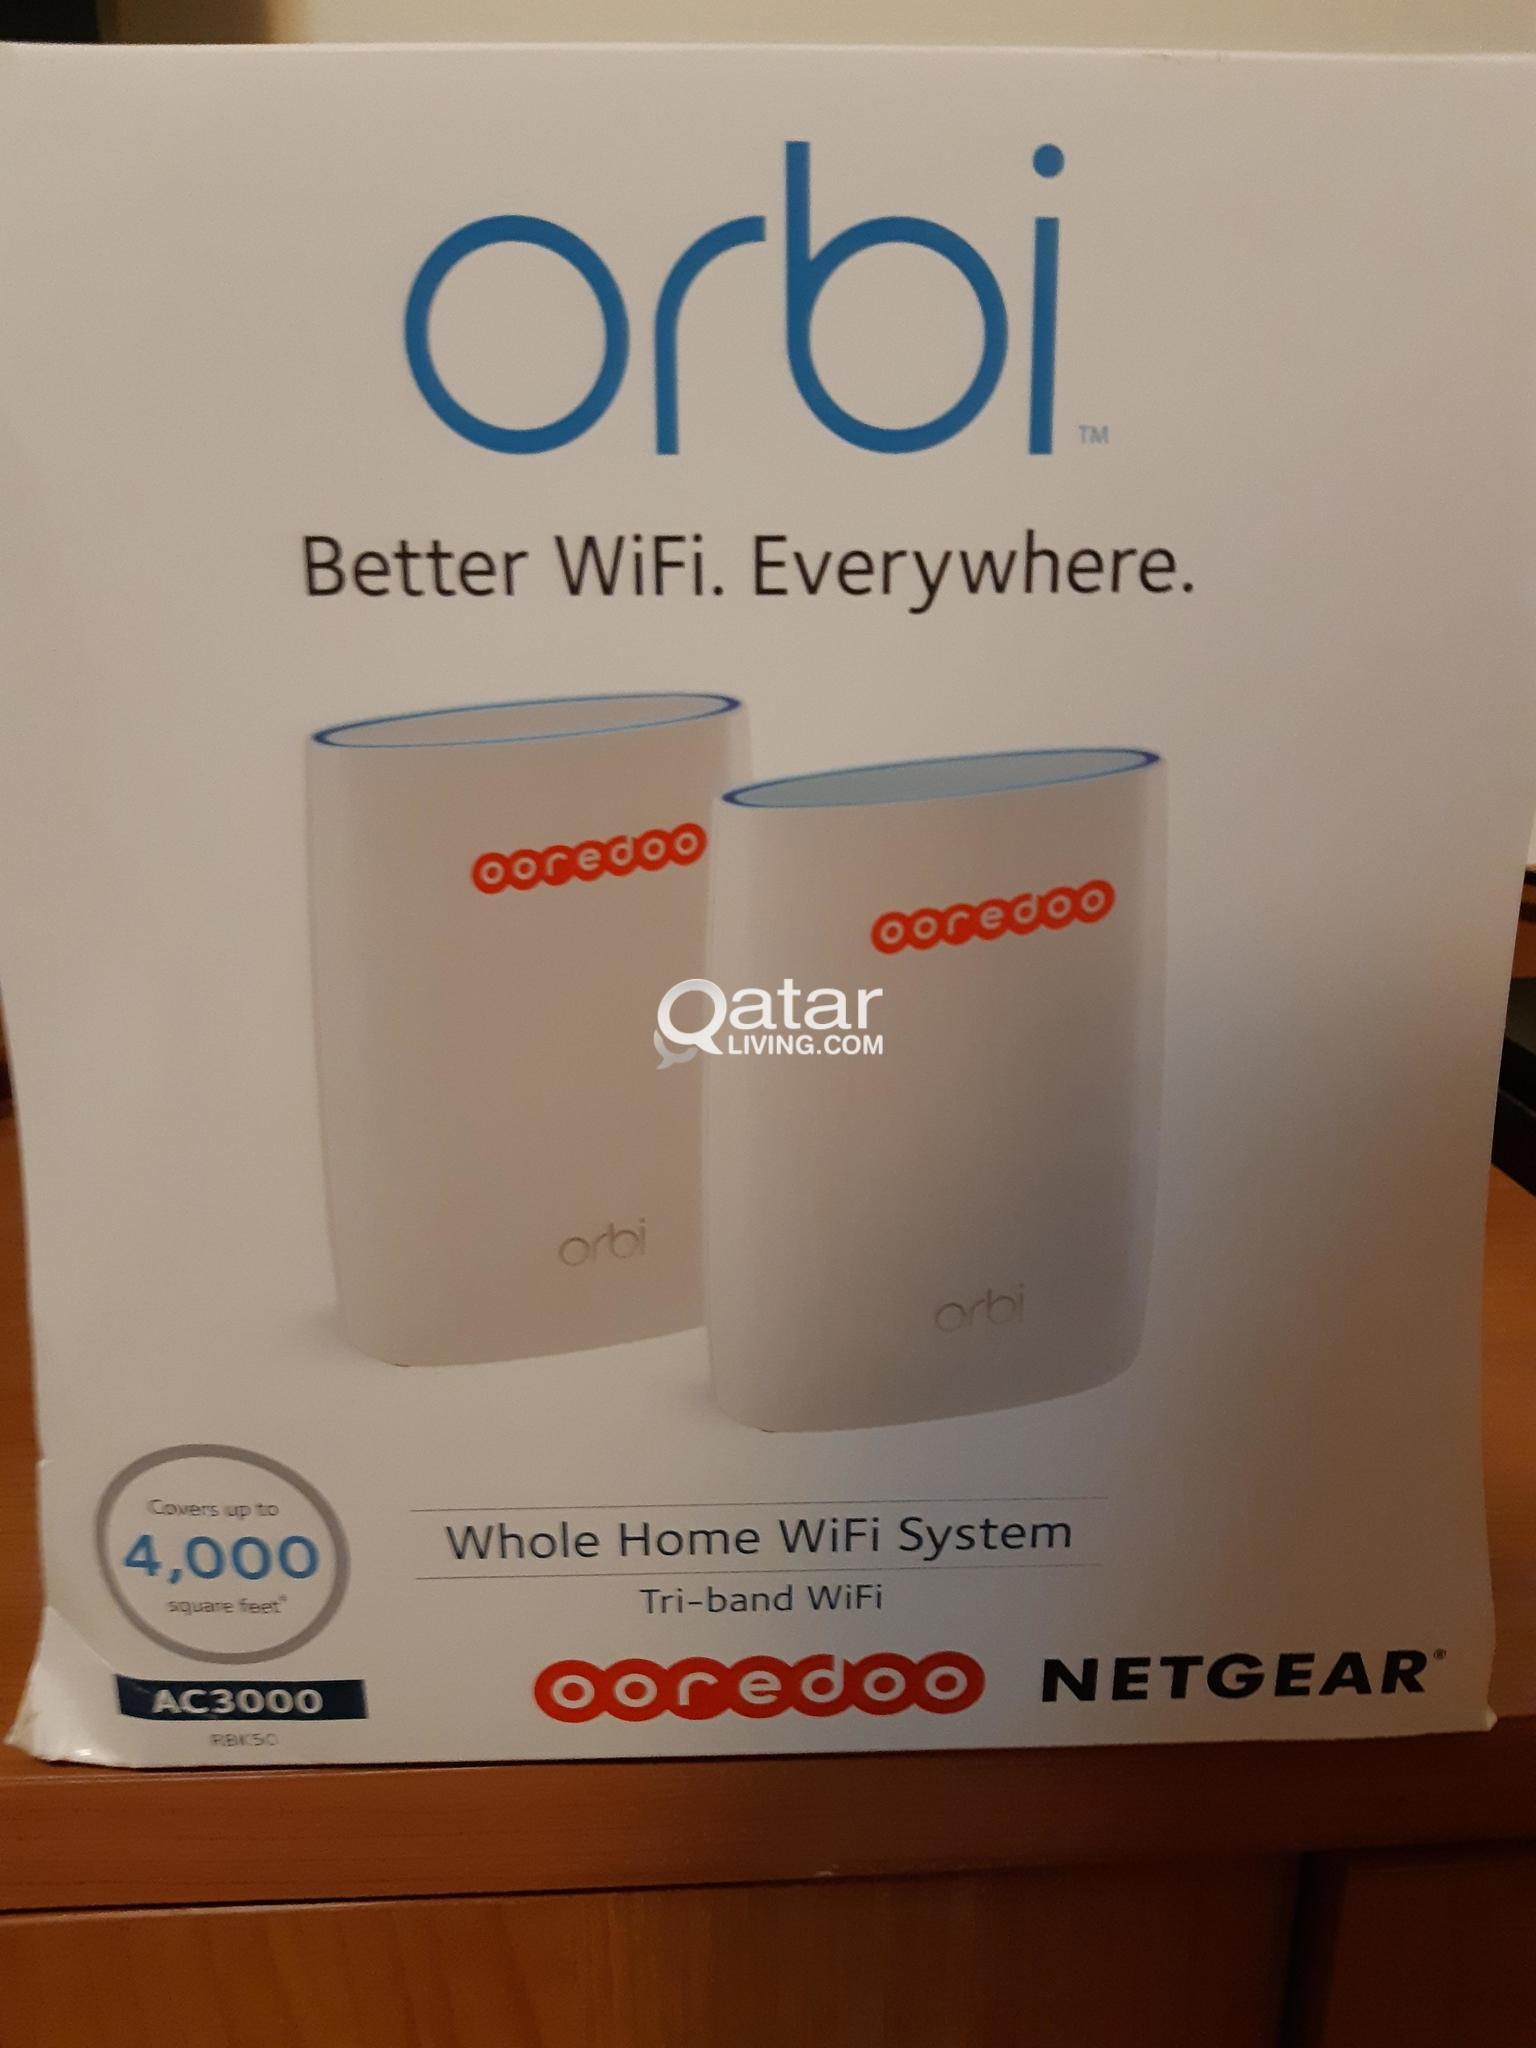 Ooredoo NETGEAR Orbi Mesh Wifi system router | Qatar Living